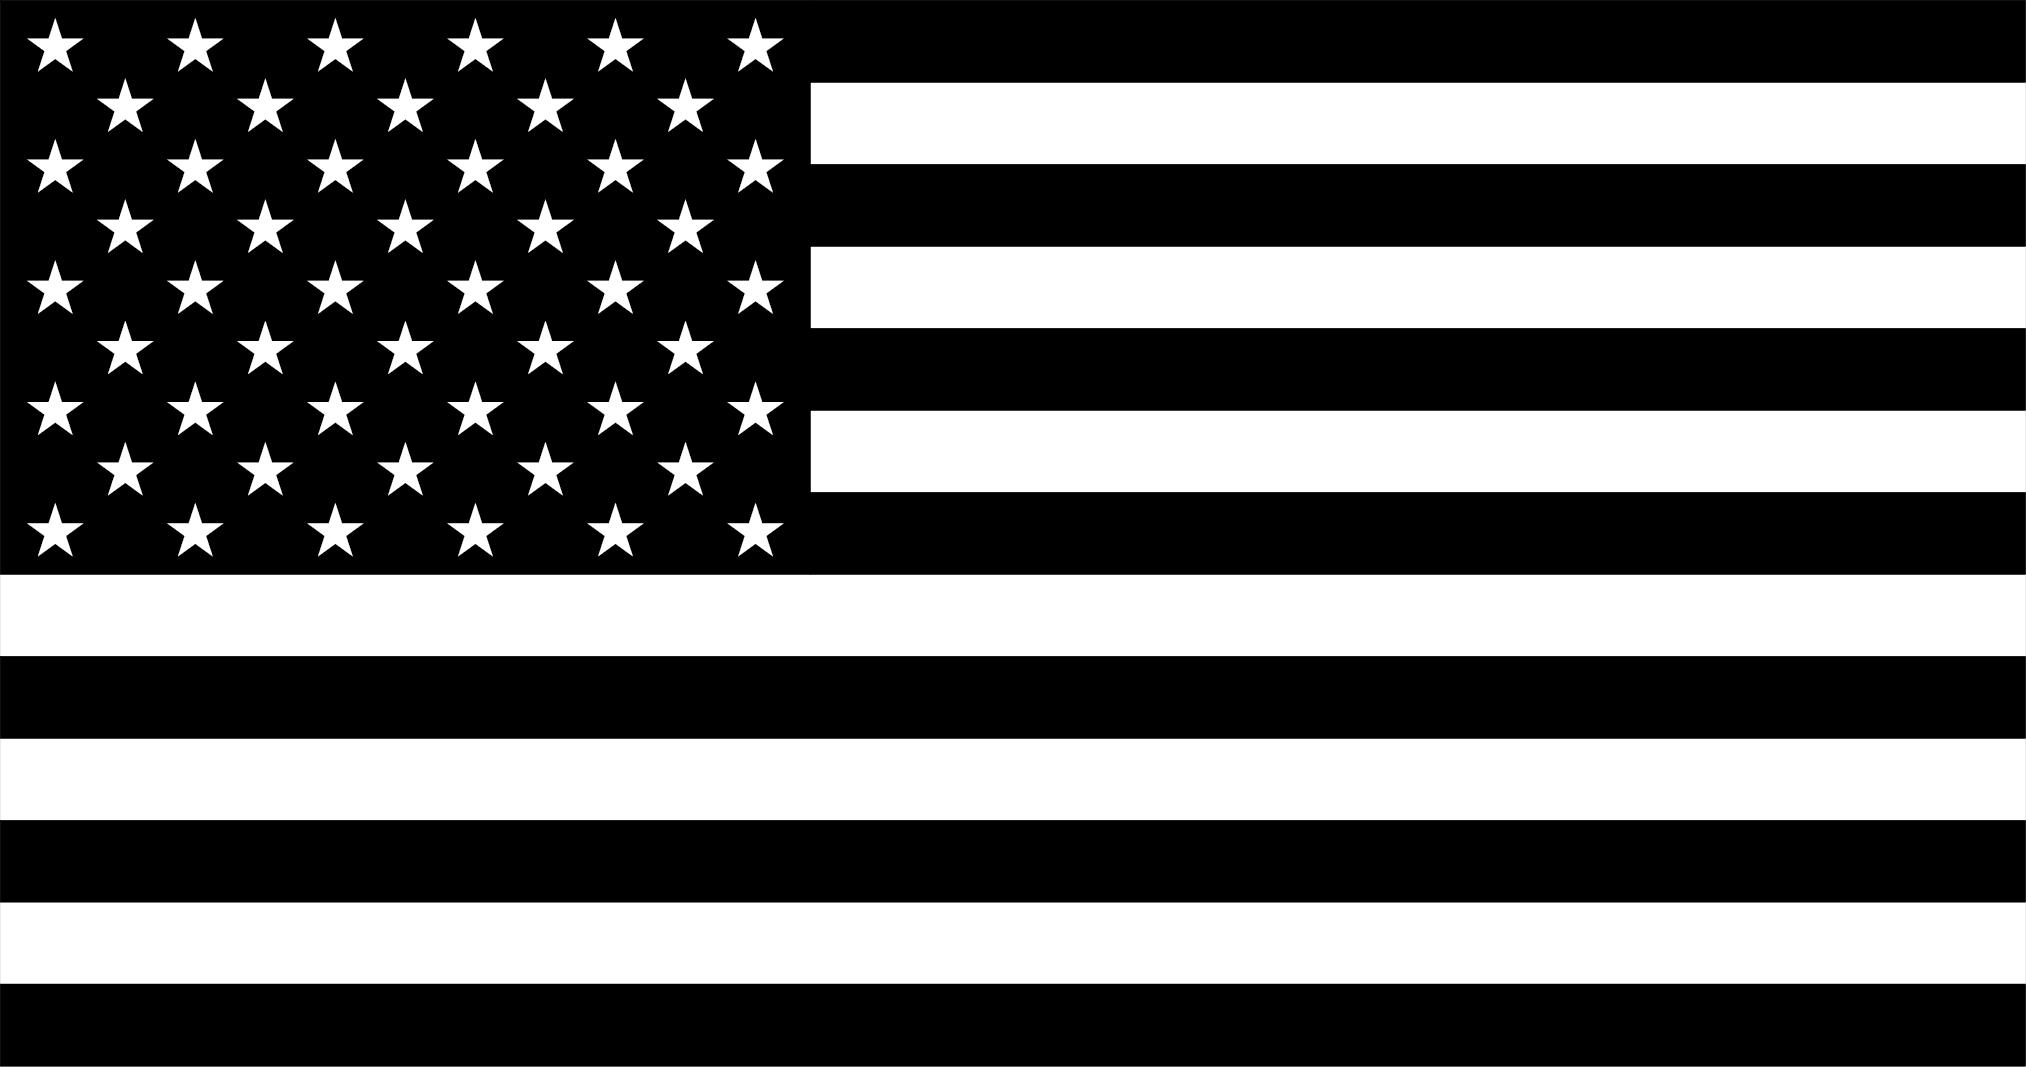 flag graphics resolution dpi web medium print text 300dpi pdf logos 430kb 305kb